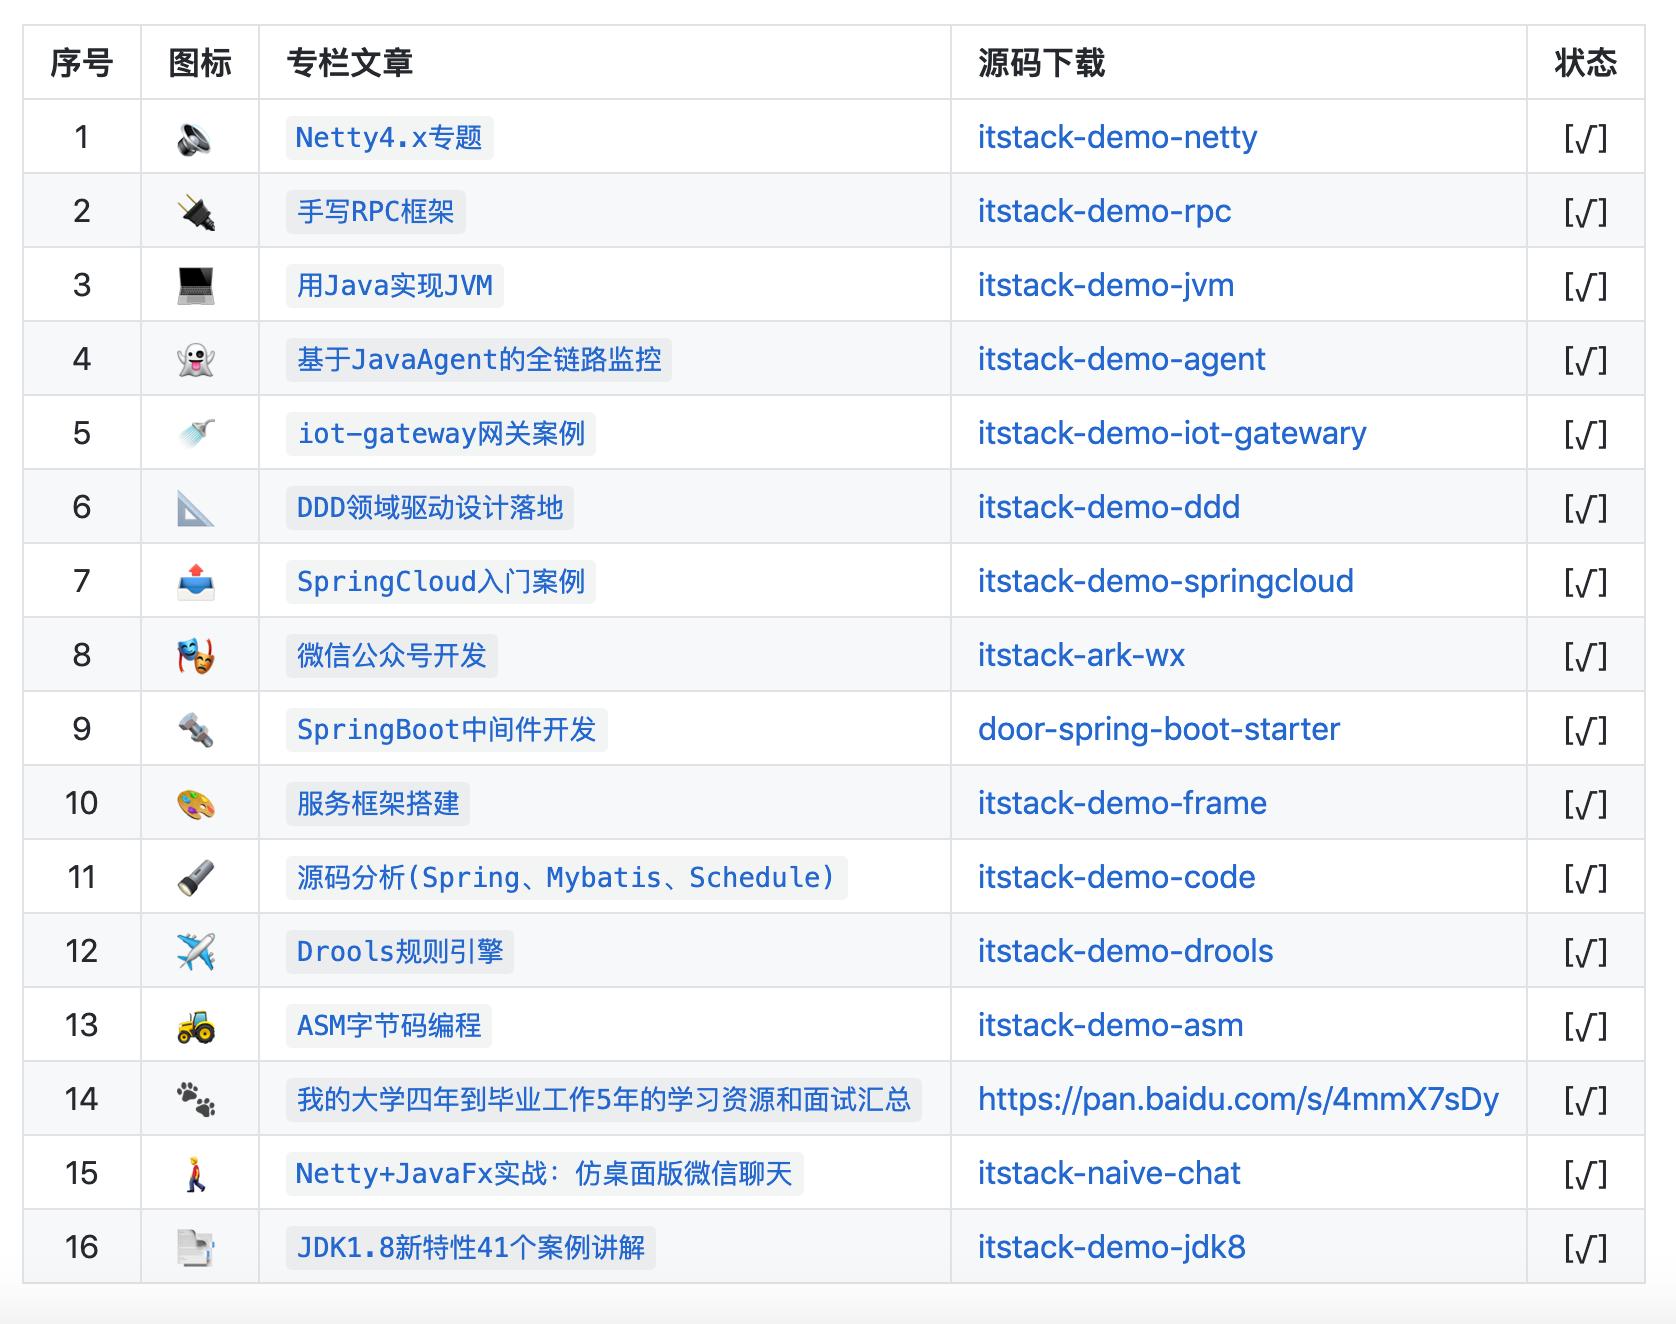 CodeGuide Wiki,程序员编码指南